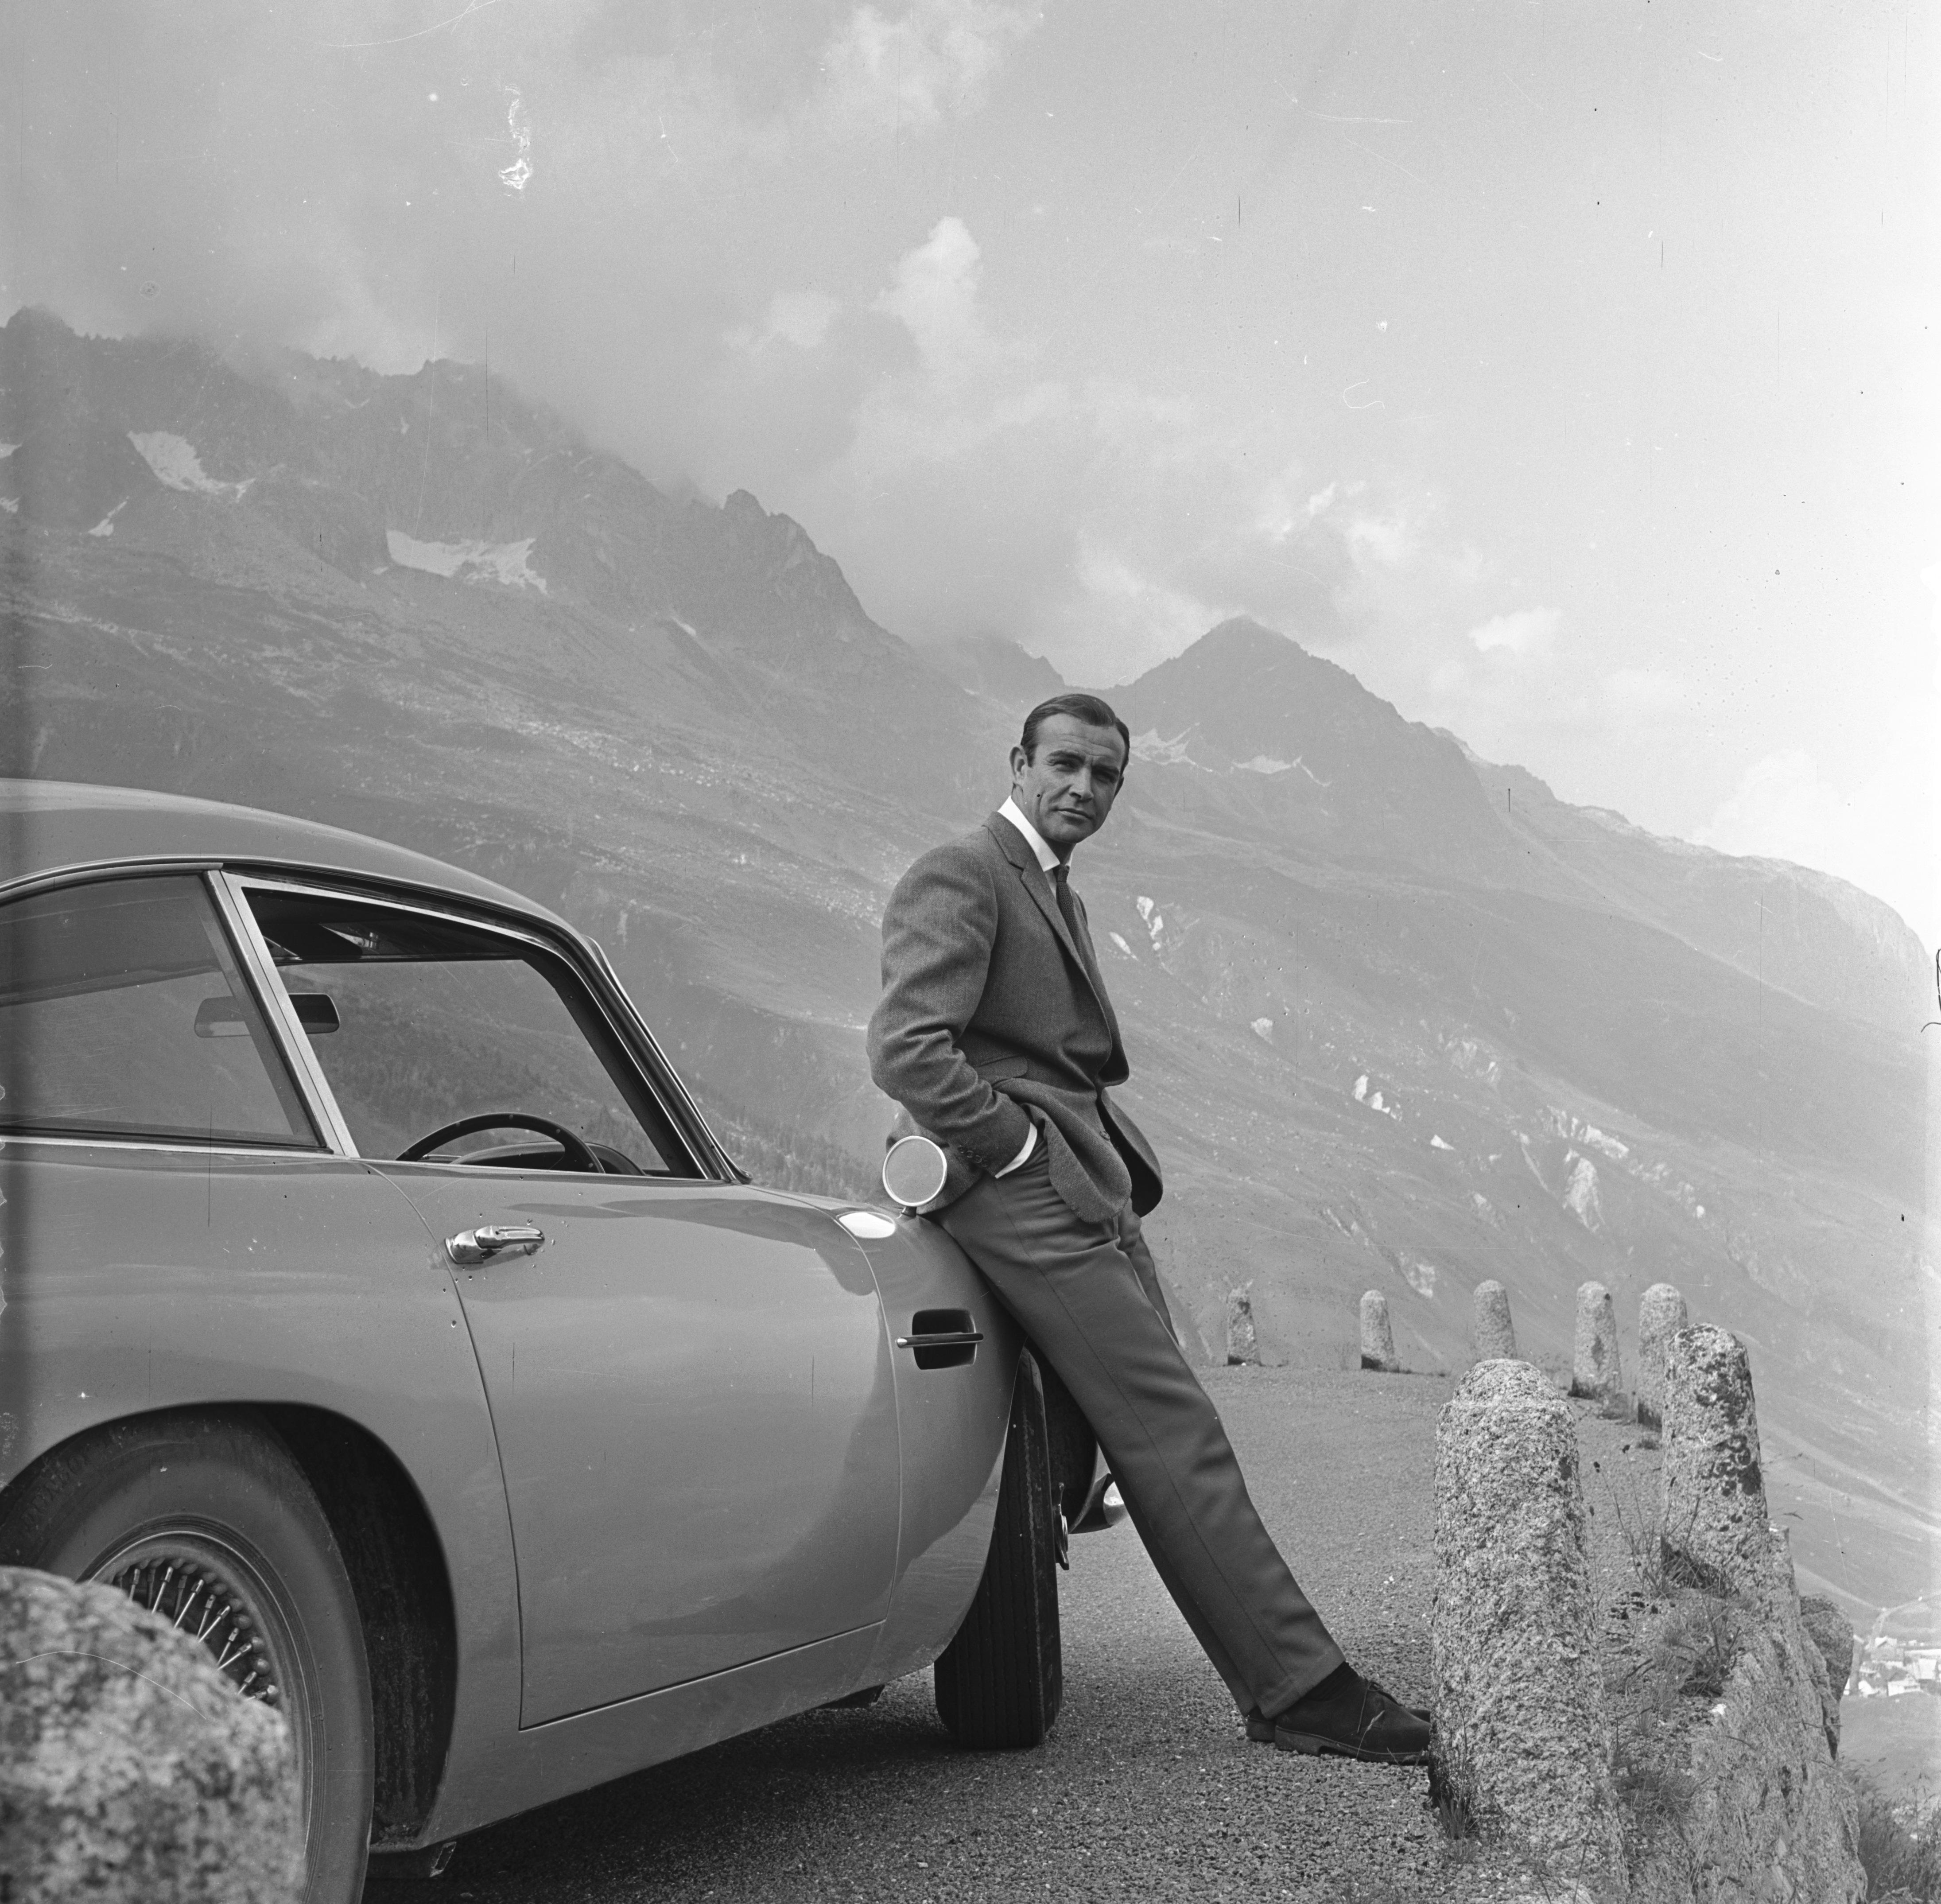 Sean Connery és az Aston Martin